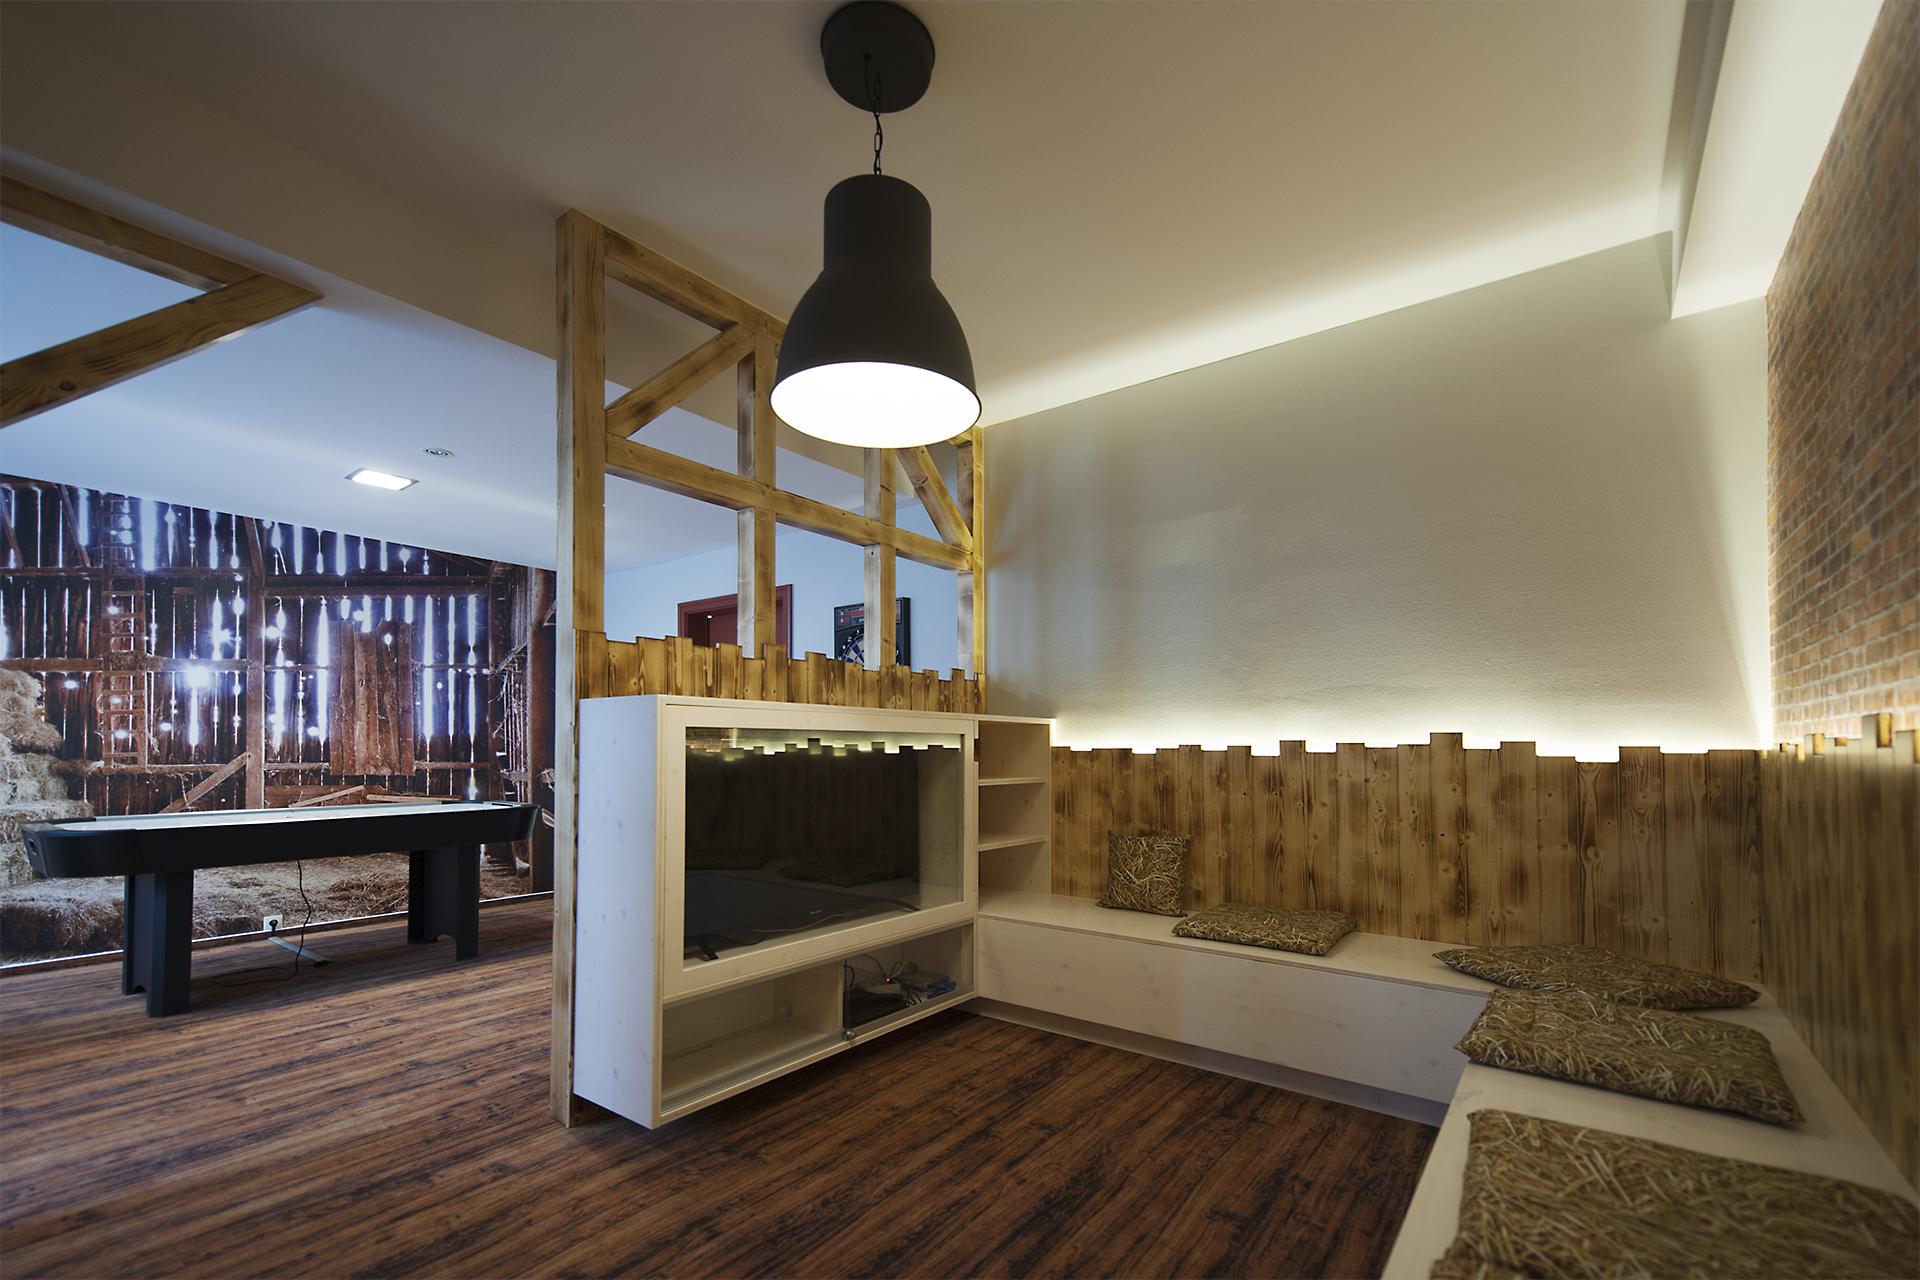 Koepke und Koepke Kita Hotel 01